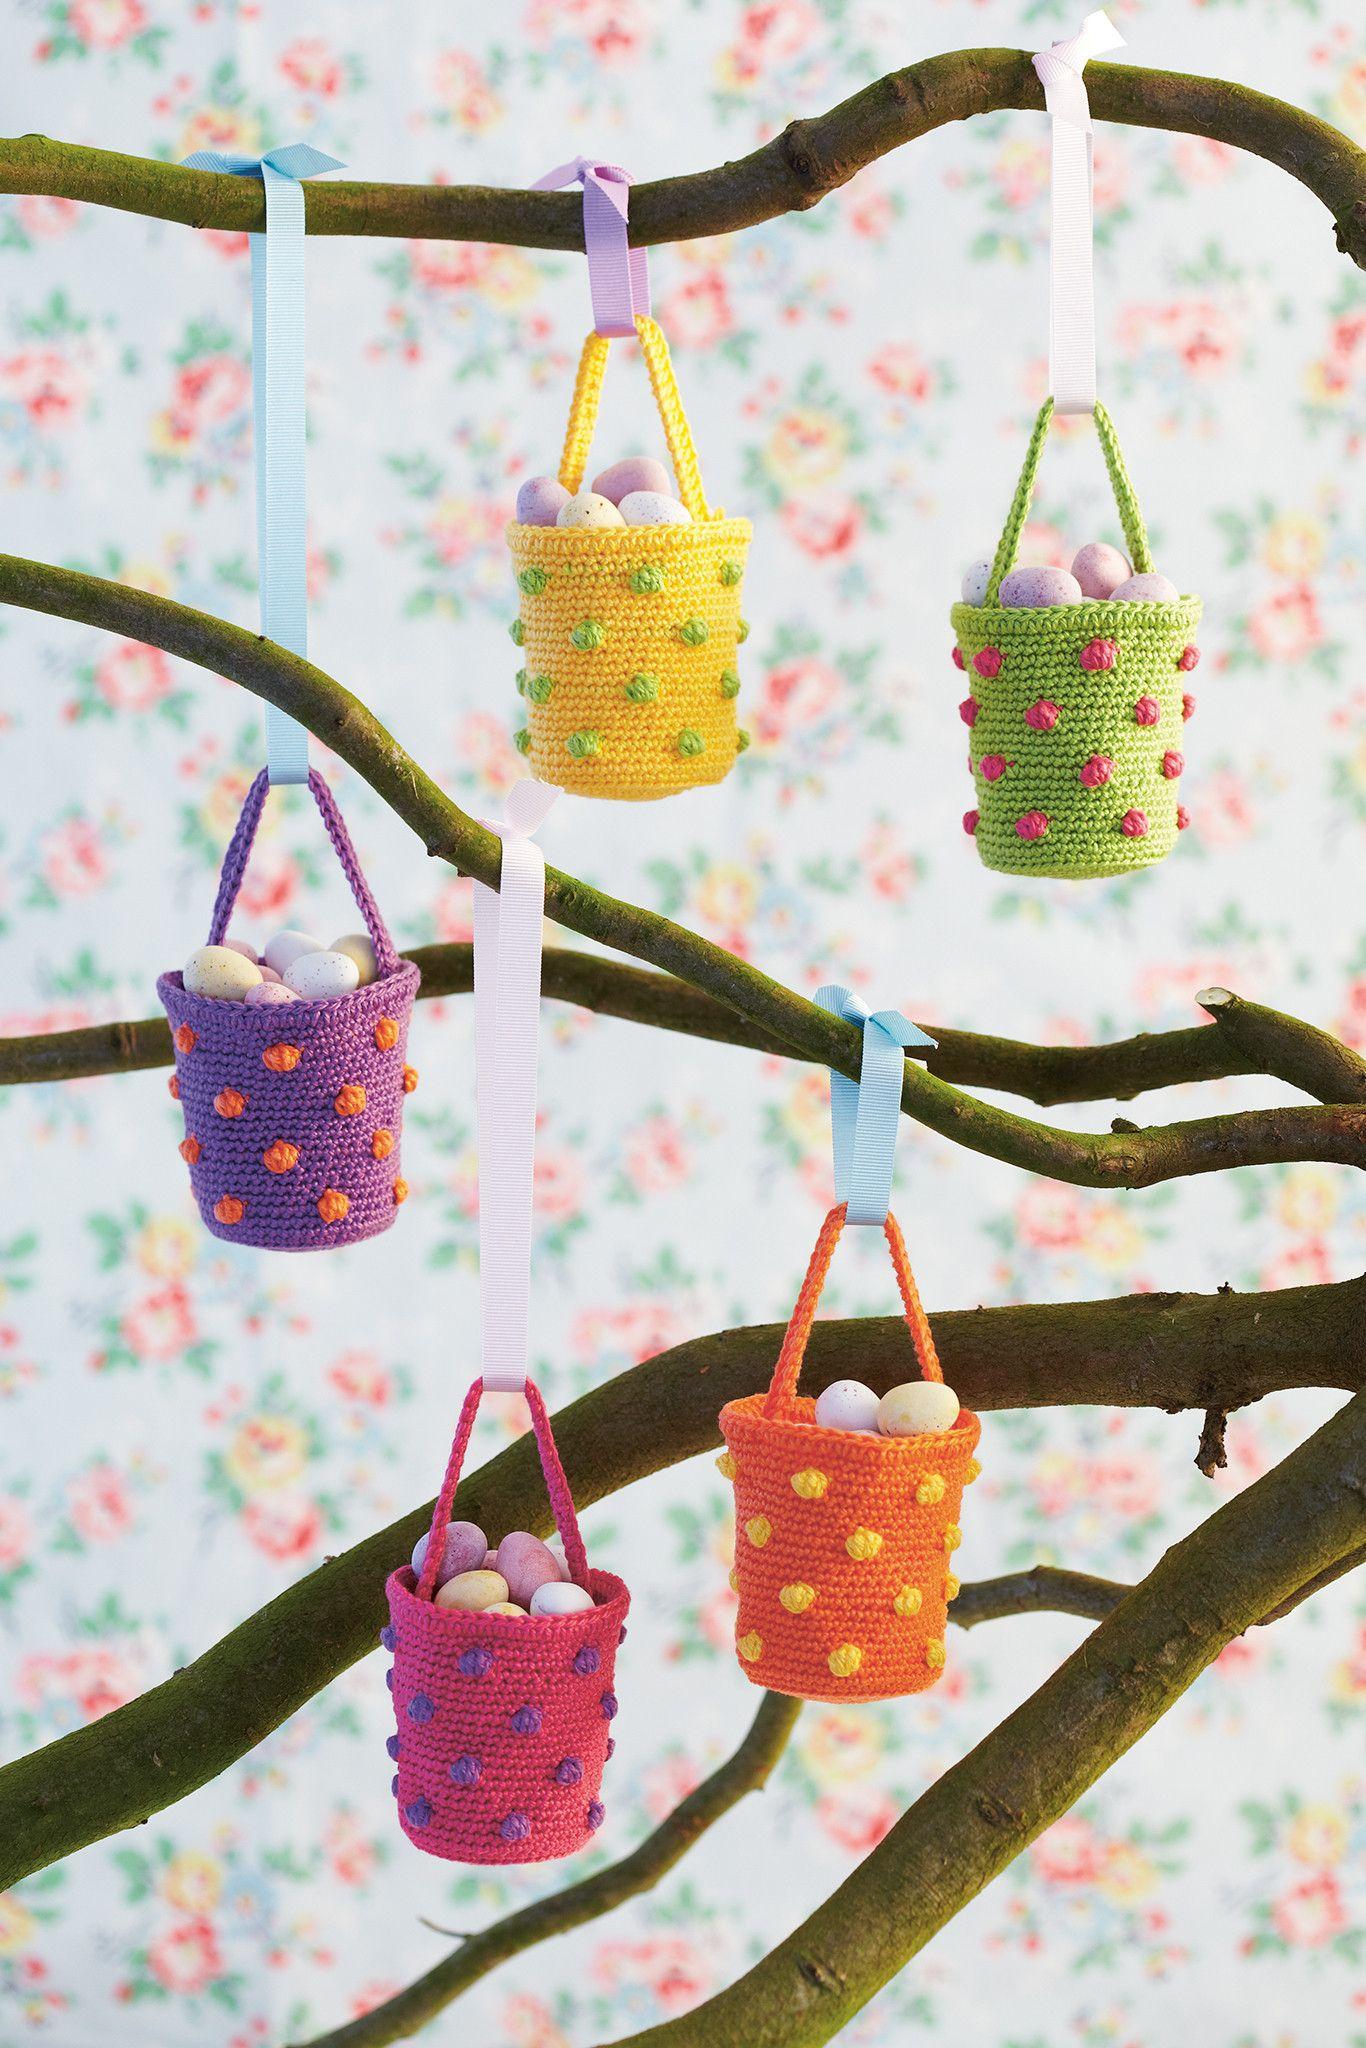 Spotty Basket Crochet Pattern | Pinterest